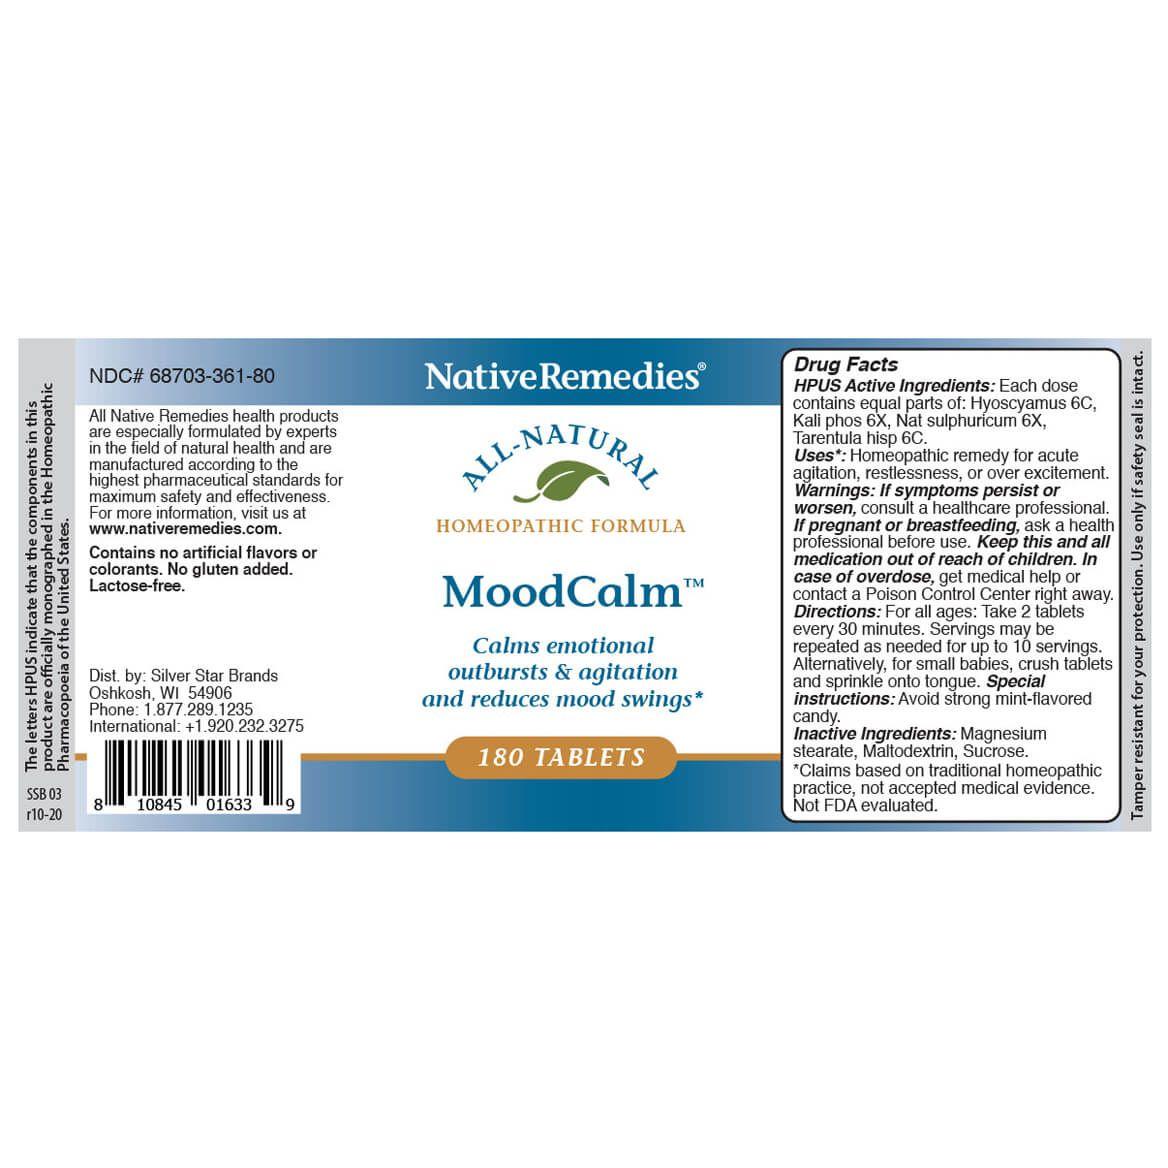 MoodCalm™ for Mood Swings & Emotional Balance-351844